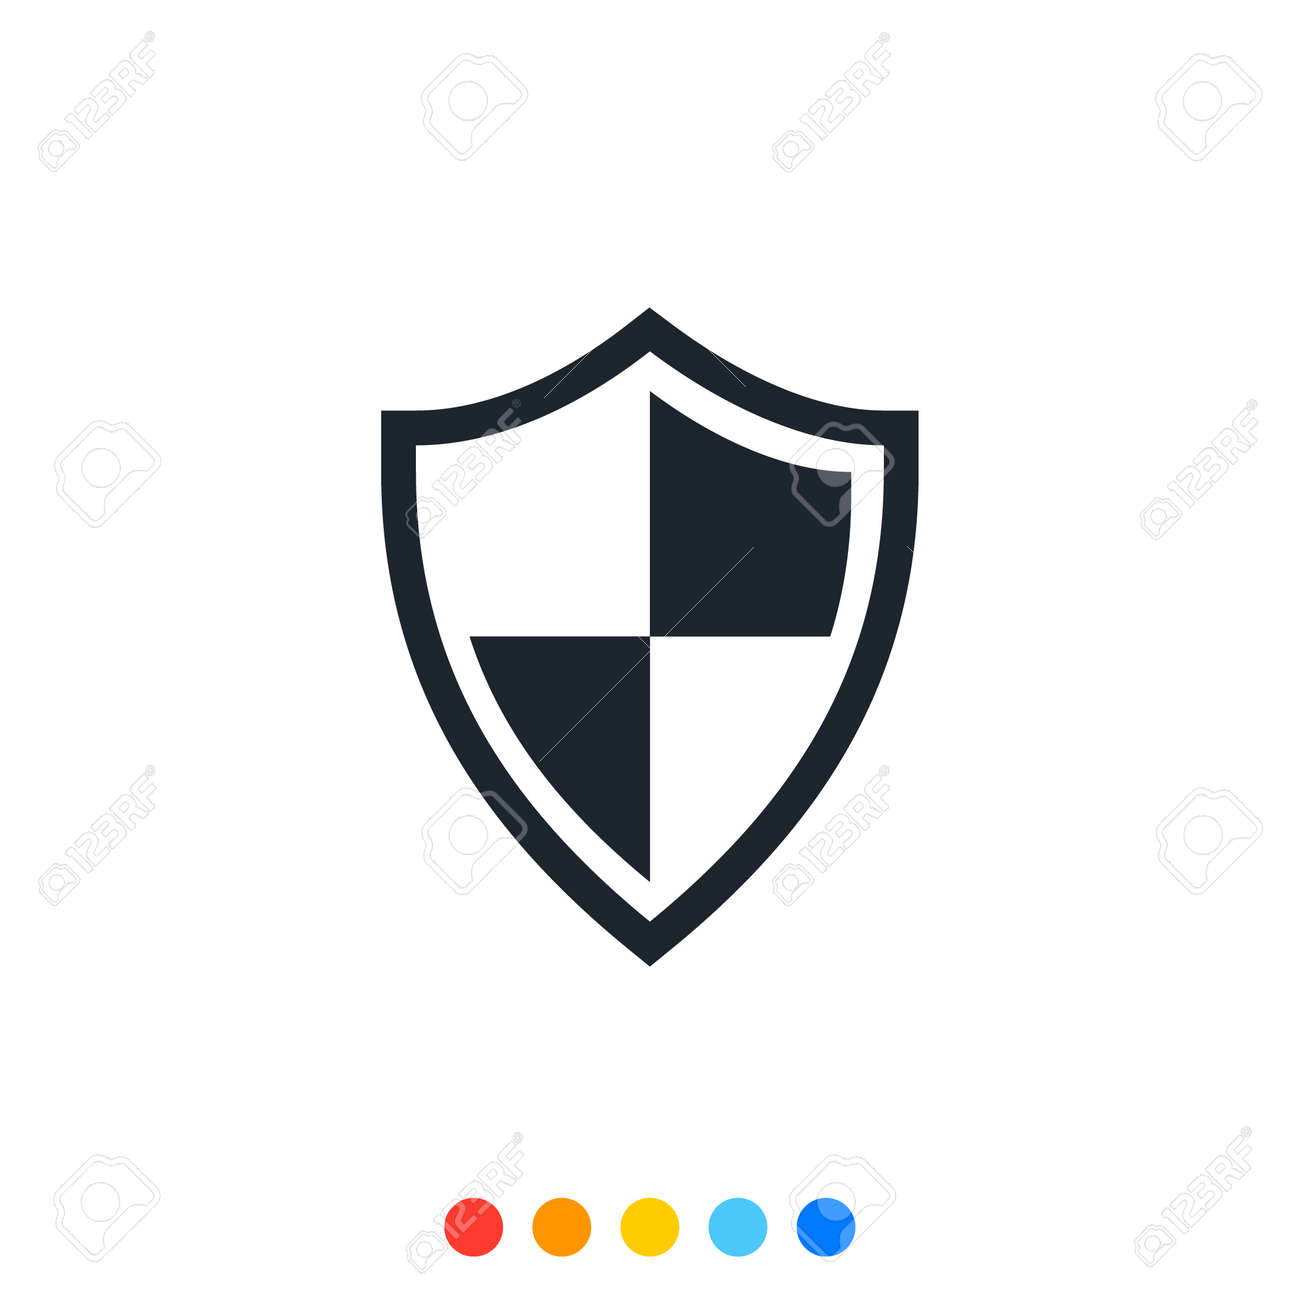 Protection shield icon,Interception icon,Antivirus icon. - 153946211